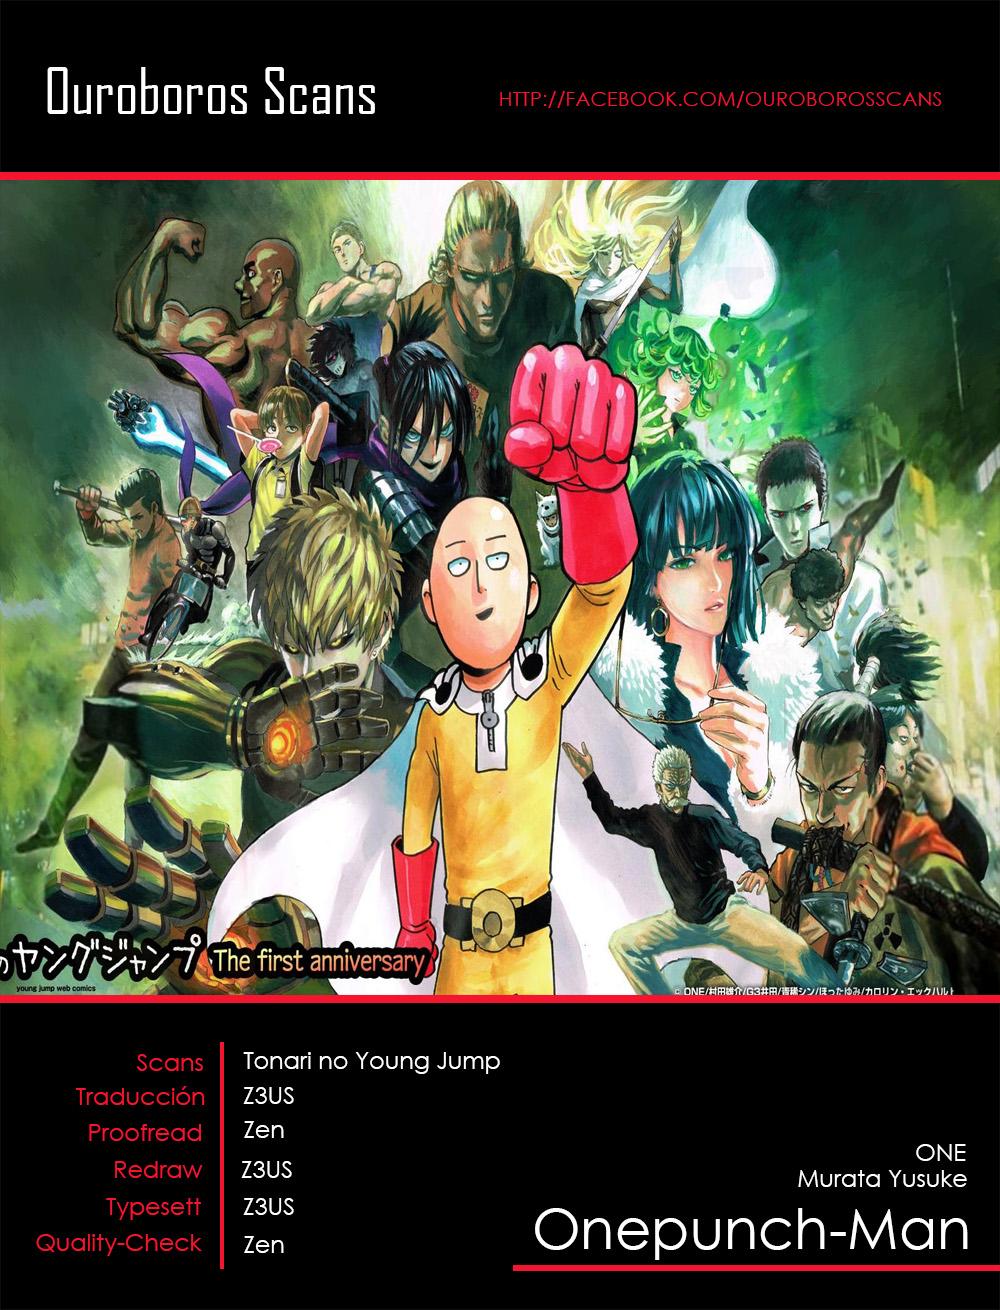 https://c5.ninemanga.com/es_manga/21/14805/390369/bd47190364d527b71e2285d511871036.jpg Page 1